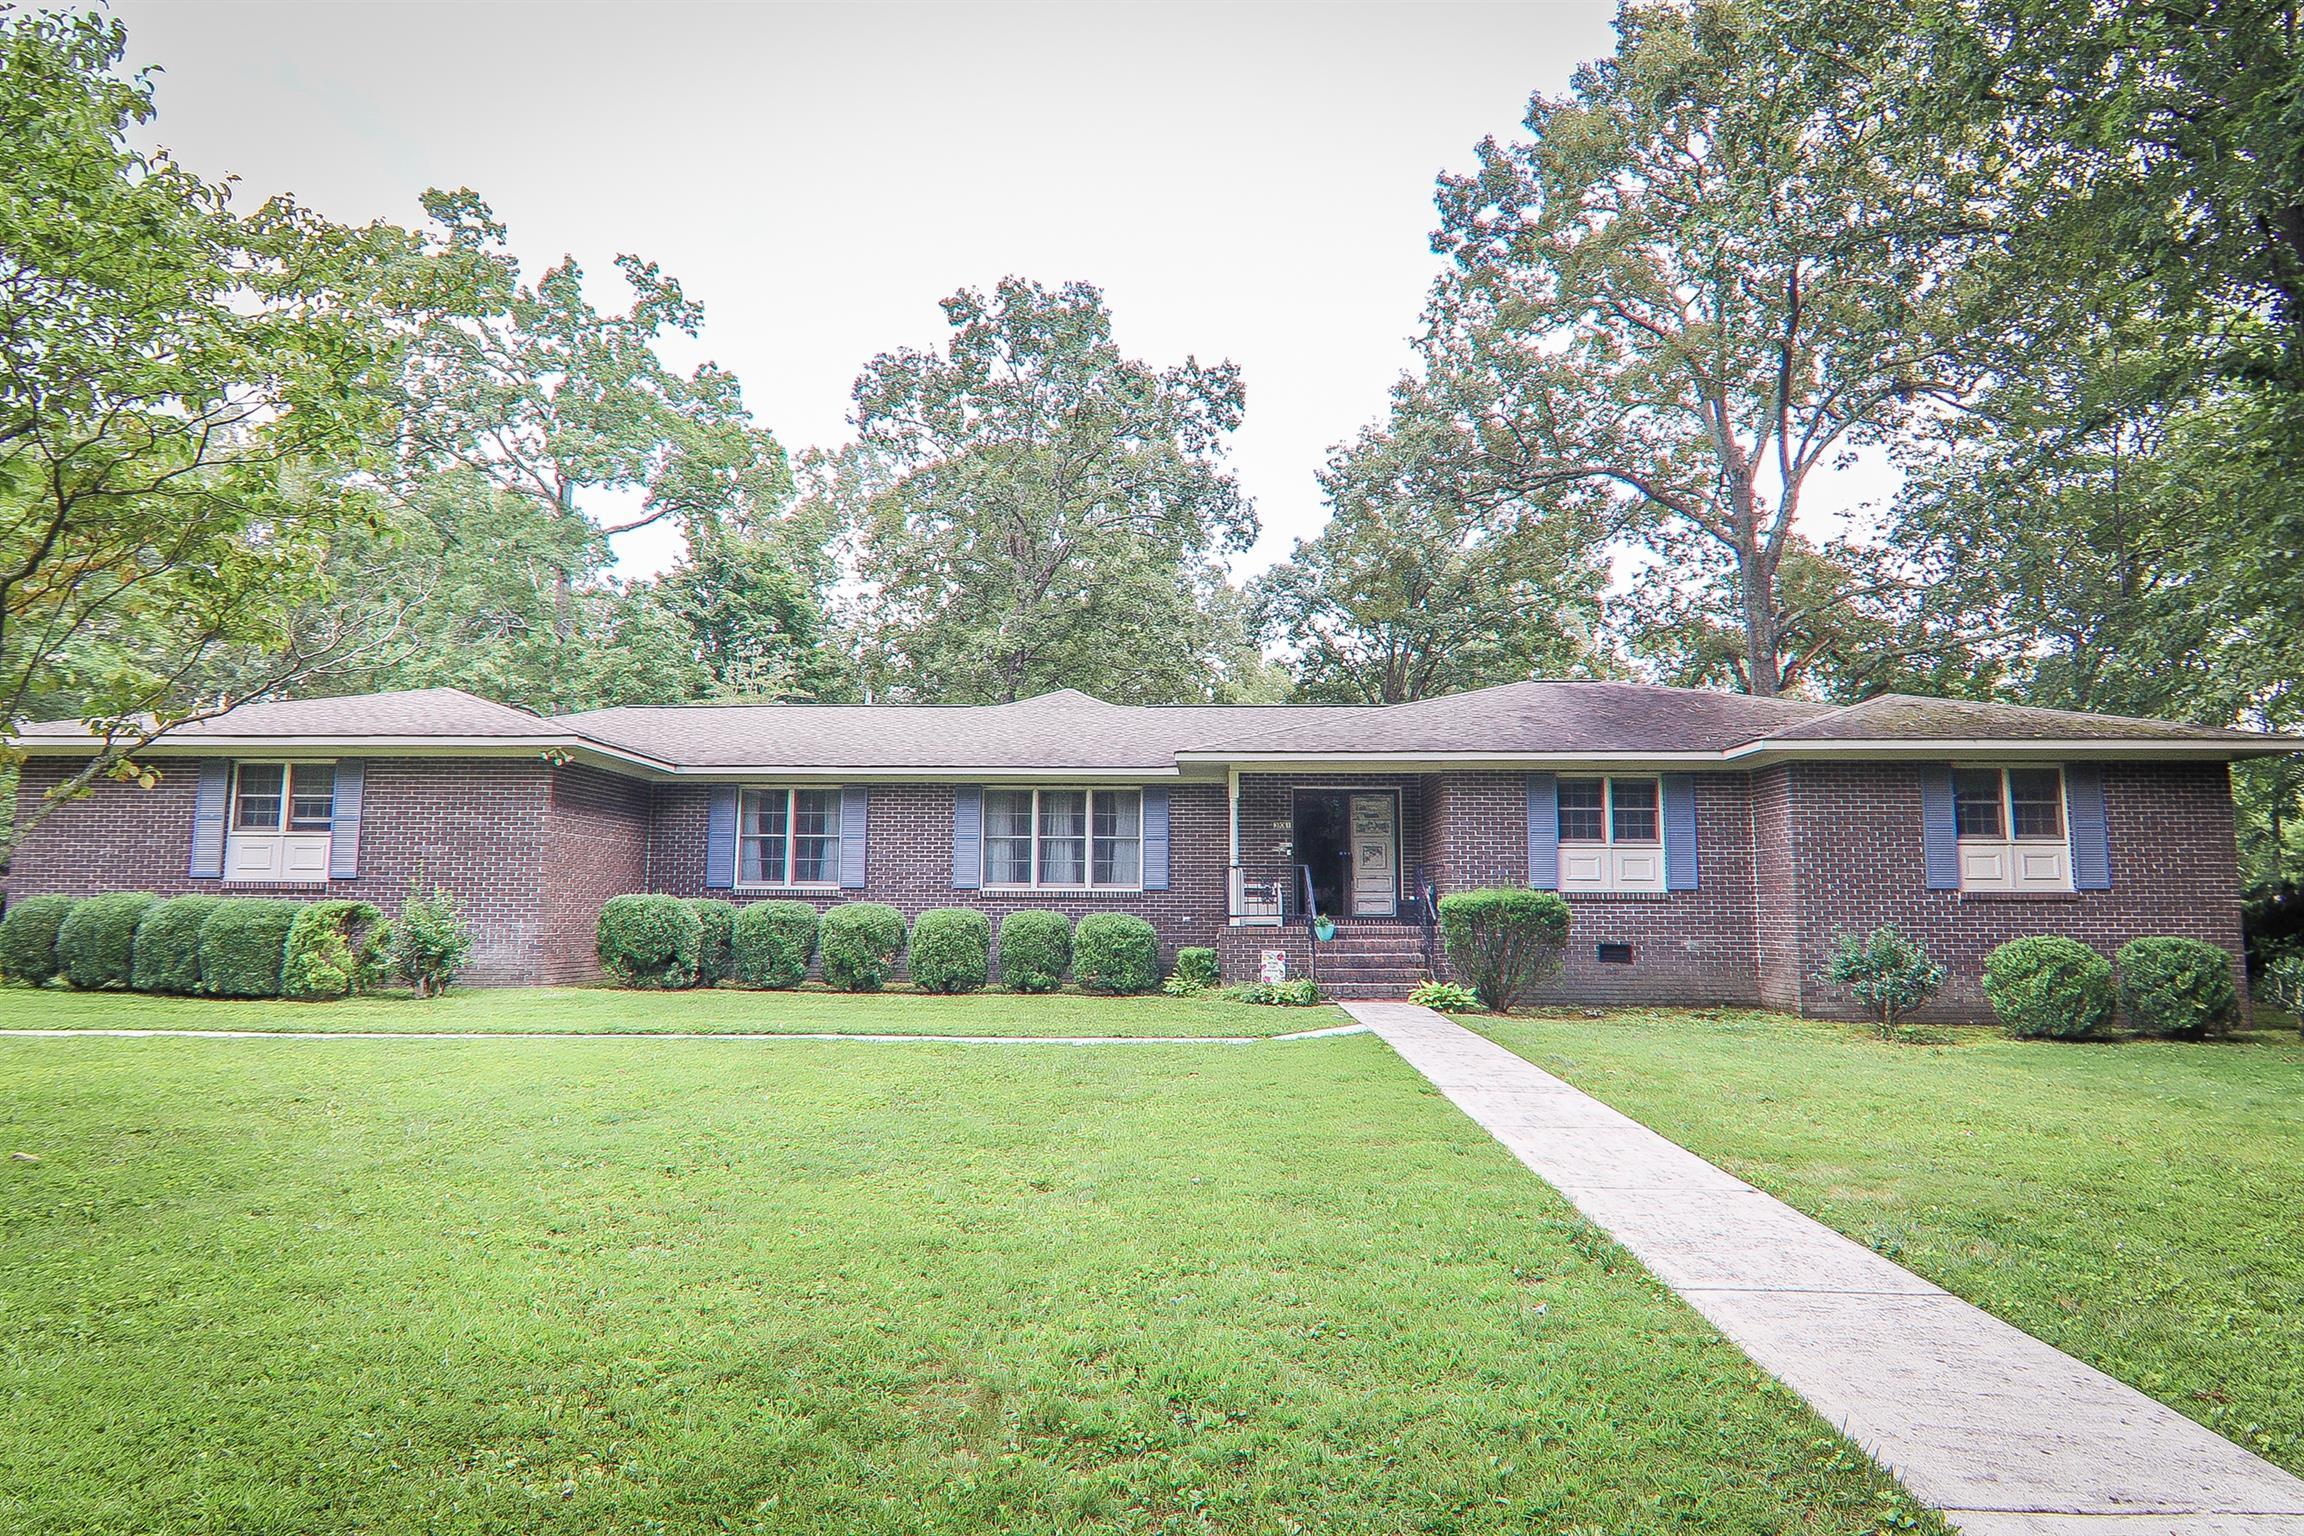 301 Sharondale Dr, Tullahoma, TN 37388 - Tullahoma, TN real estate listing